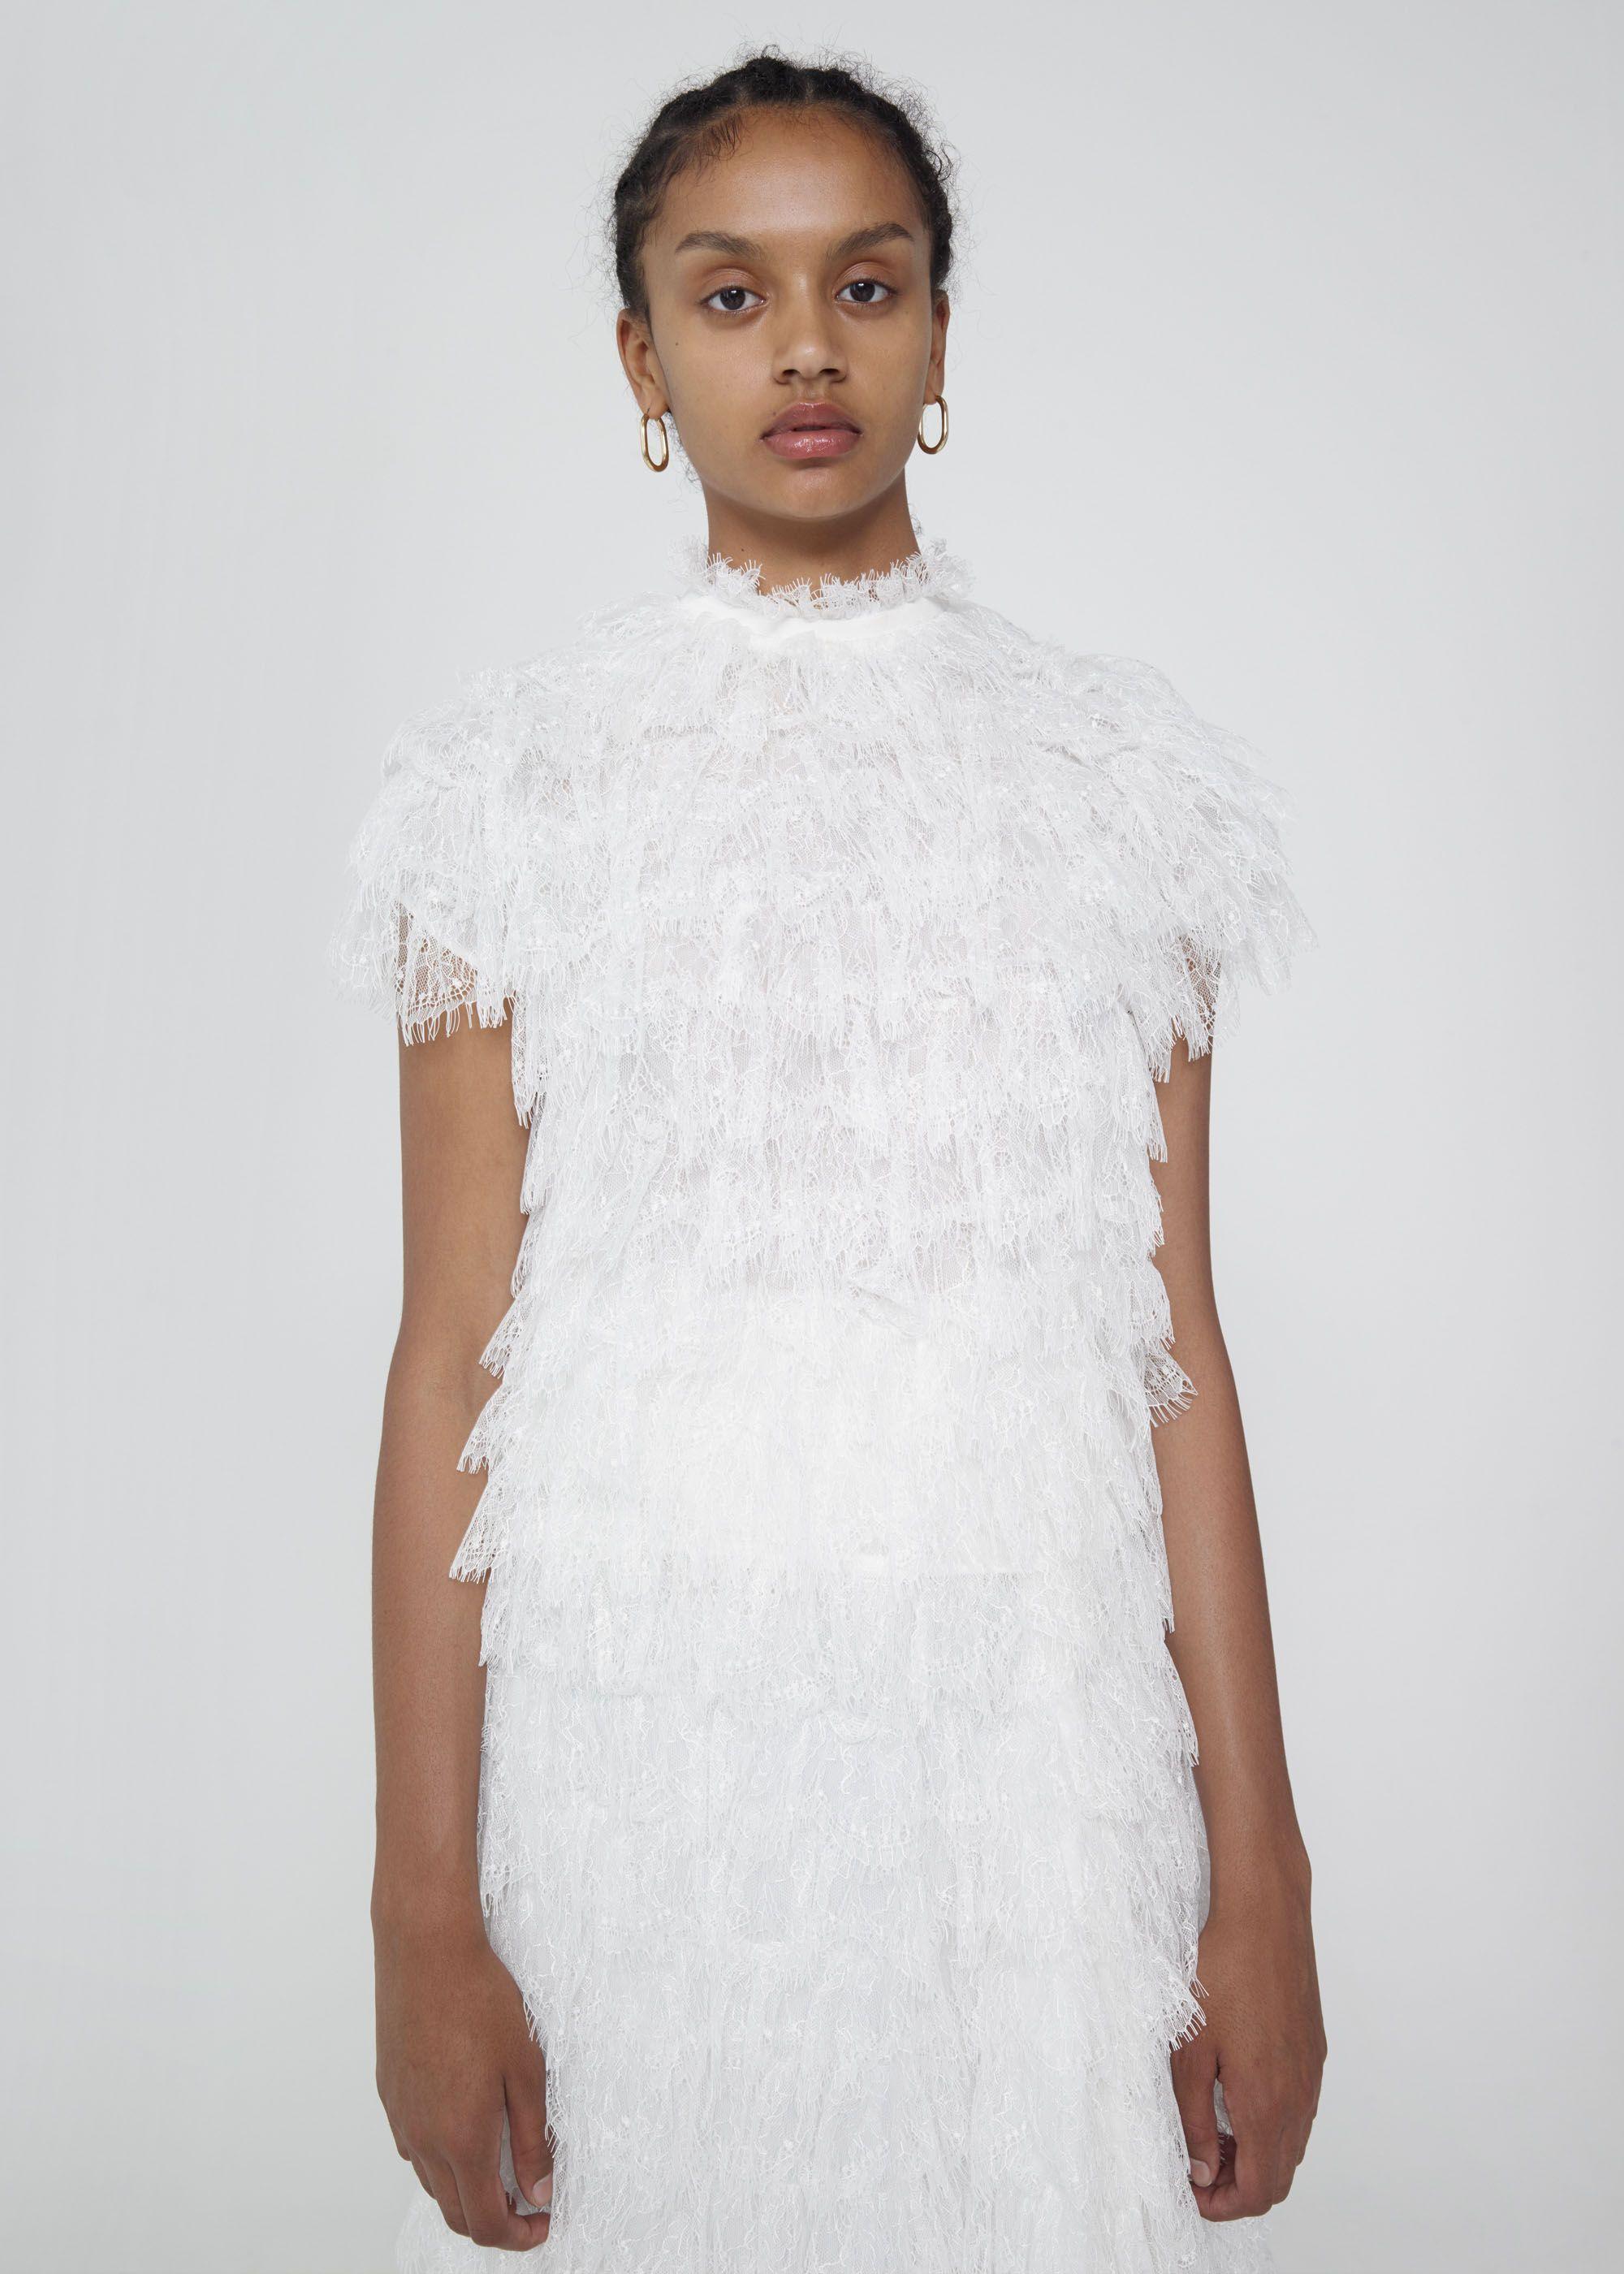 white fullruffle blouse